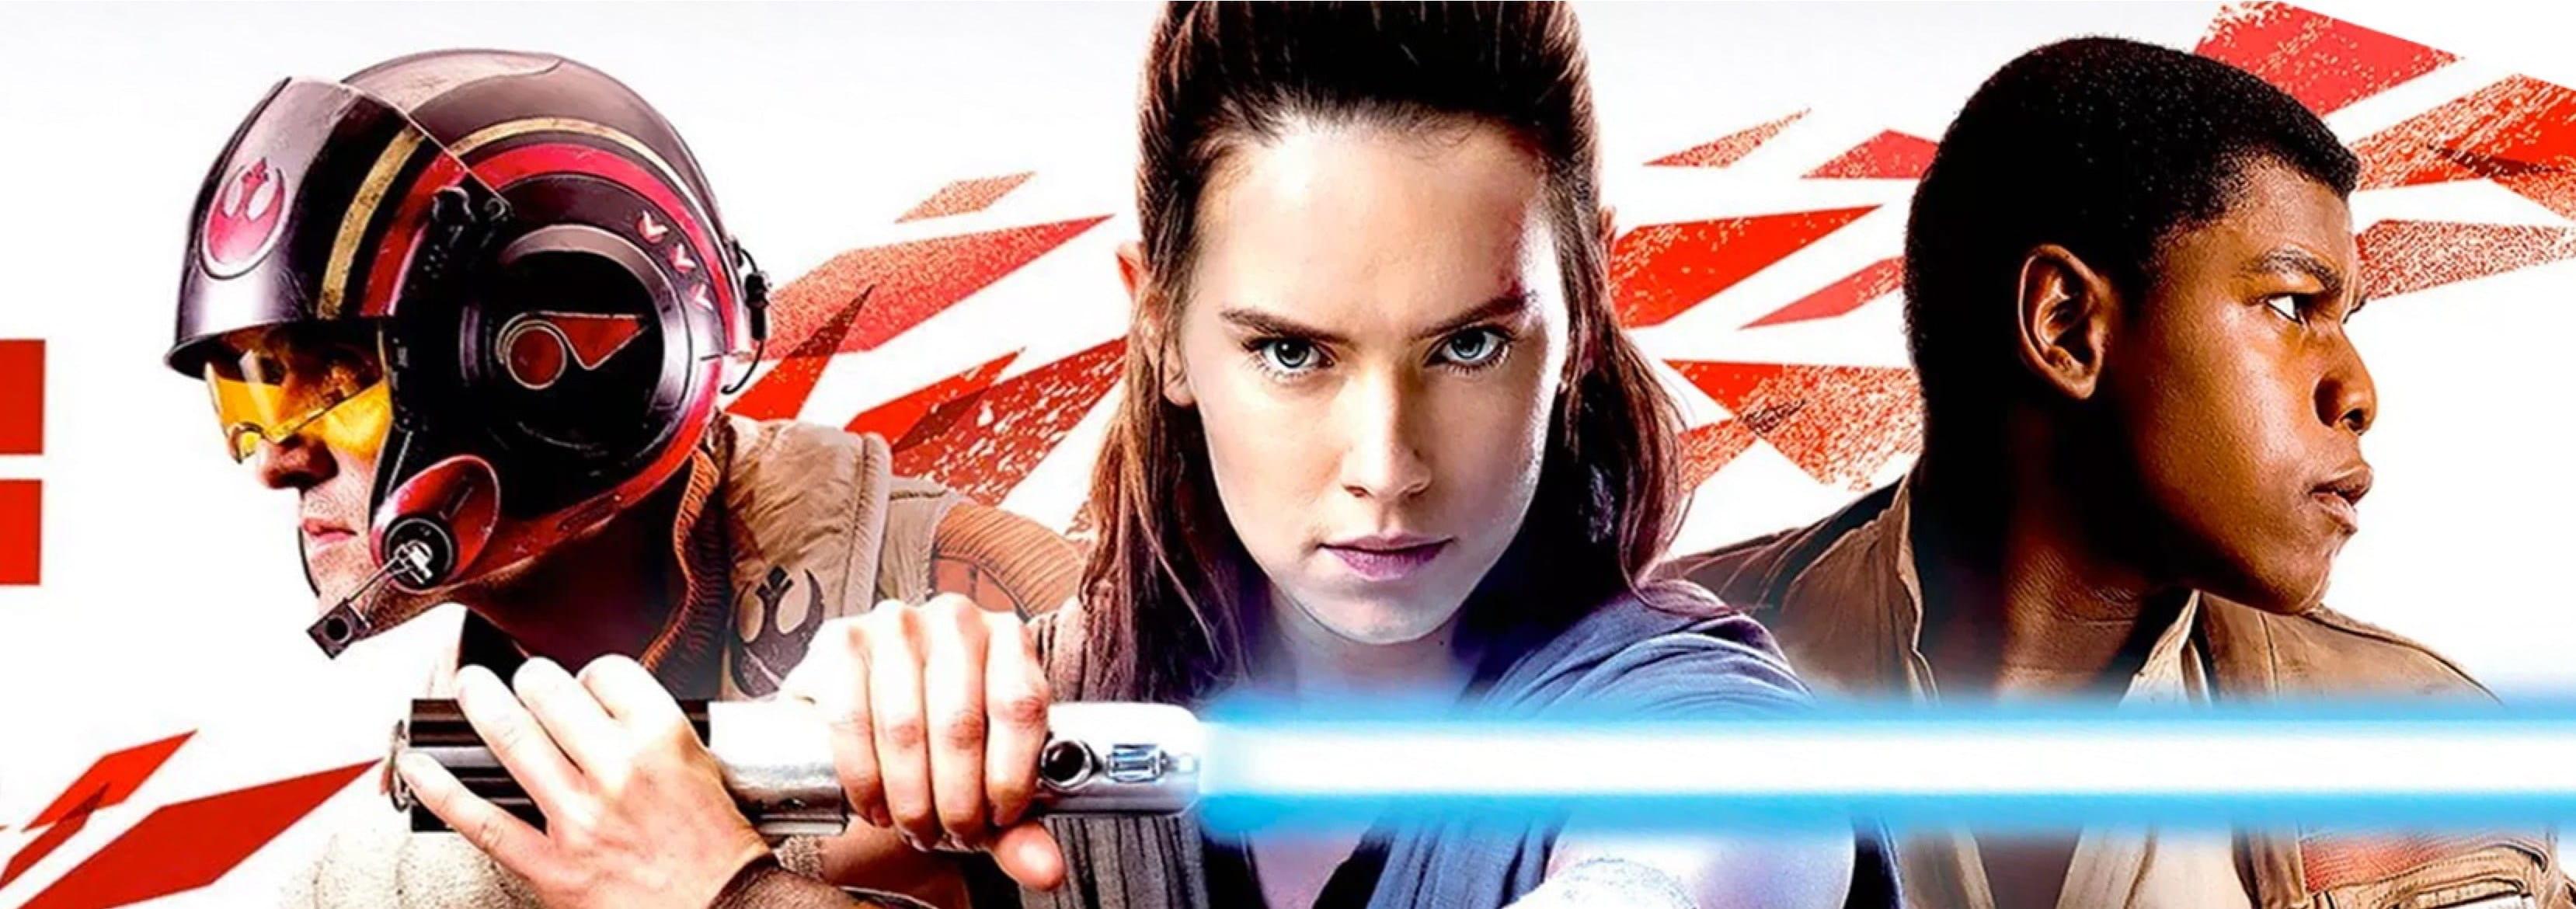 Star Wars Os Últimos Jedis